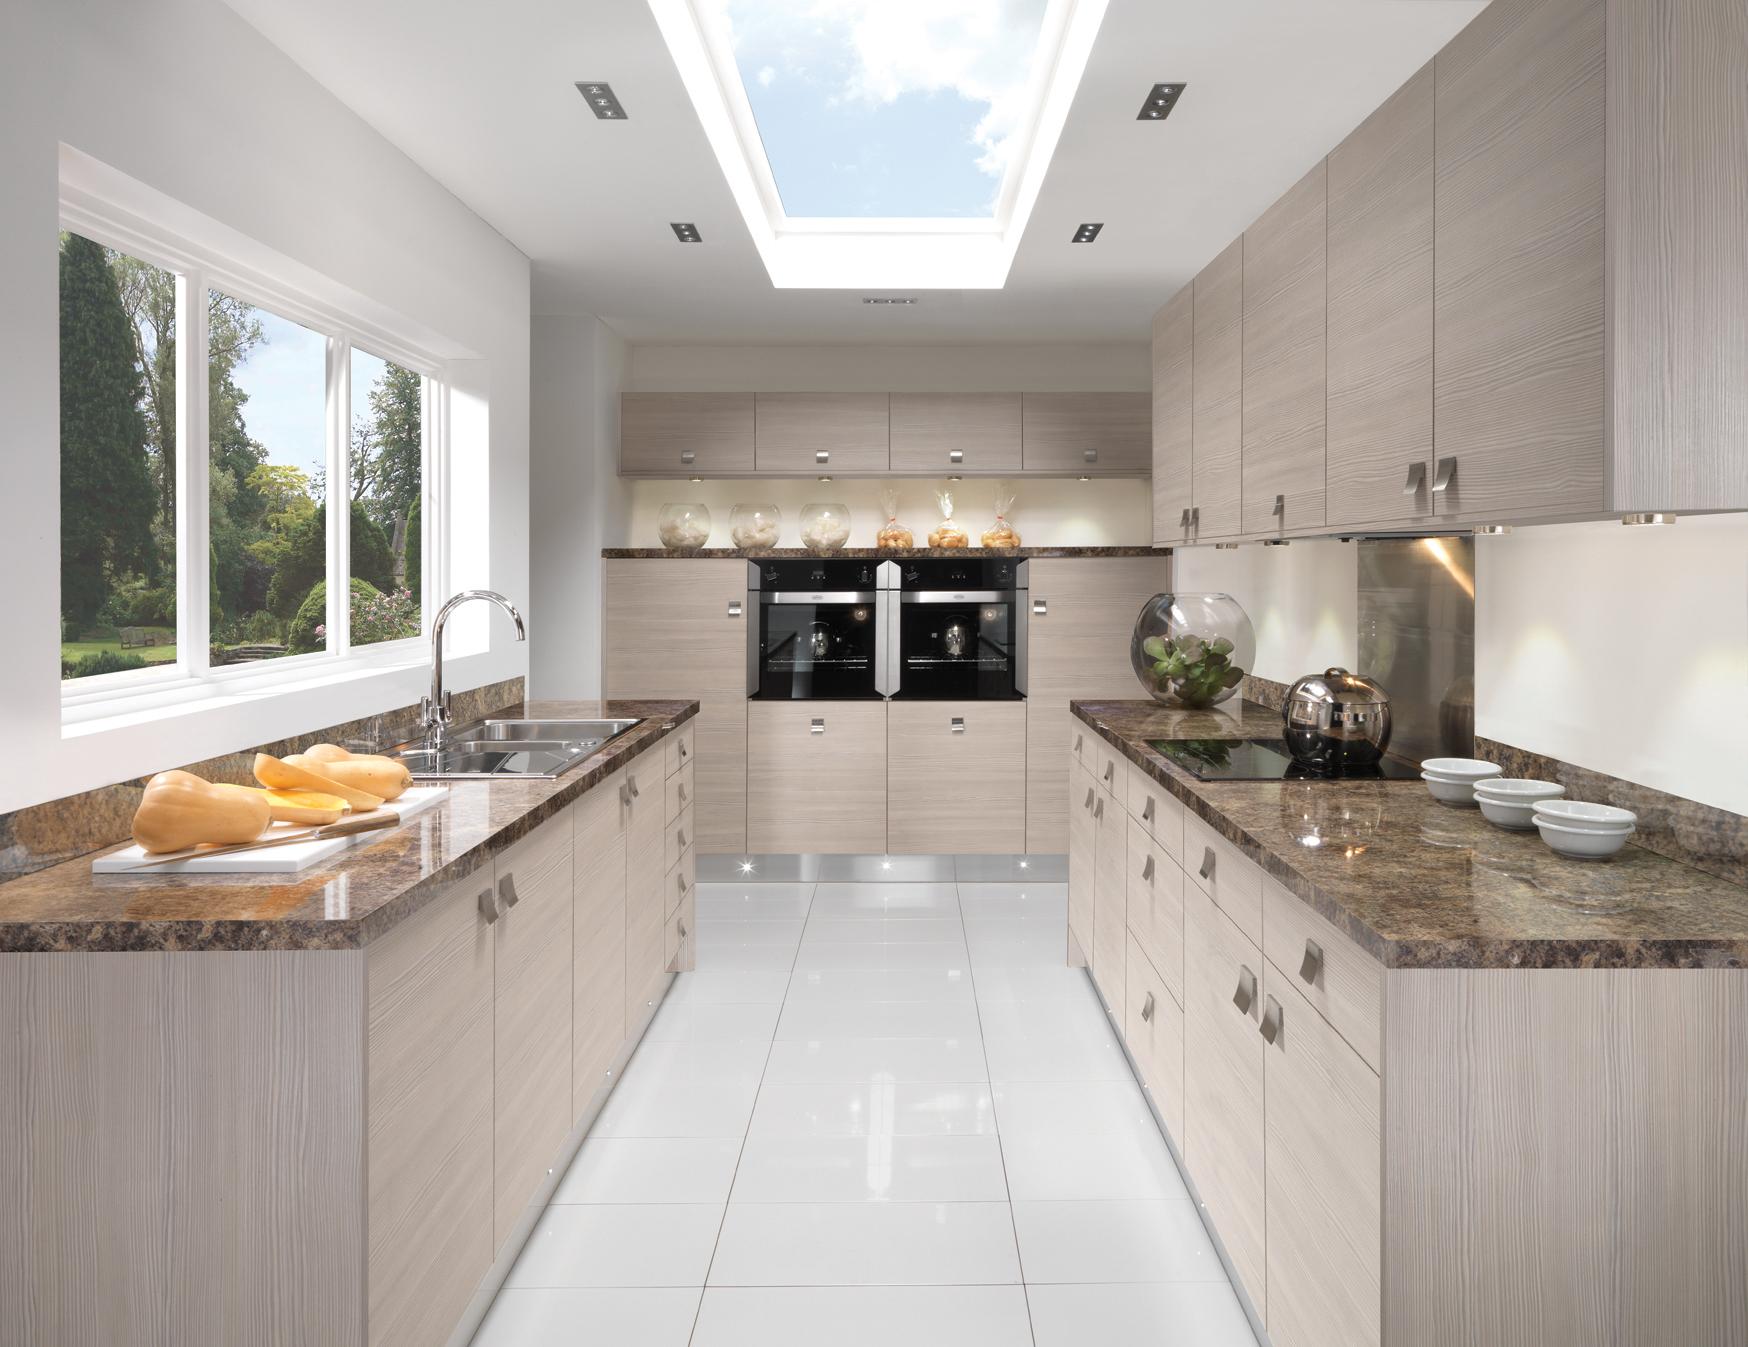 Budget kitchens eco kitchens anne wright kitchens for Budget kitchens